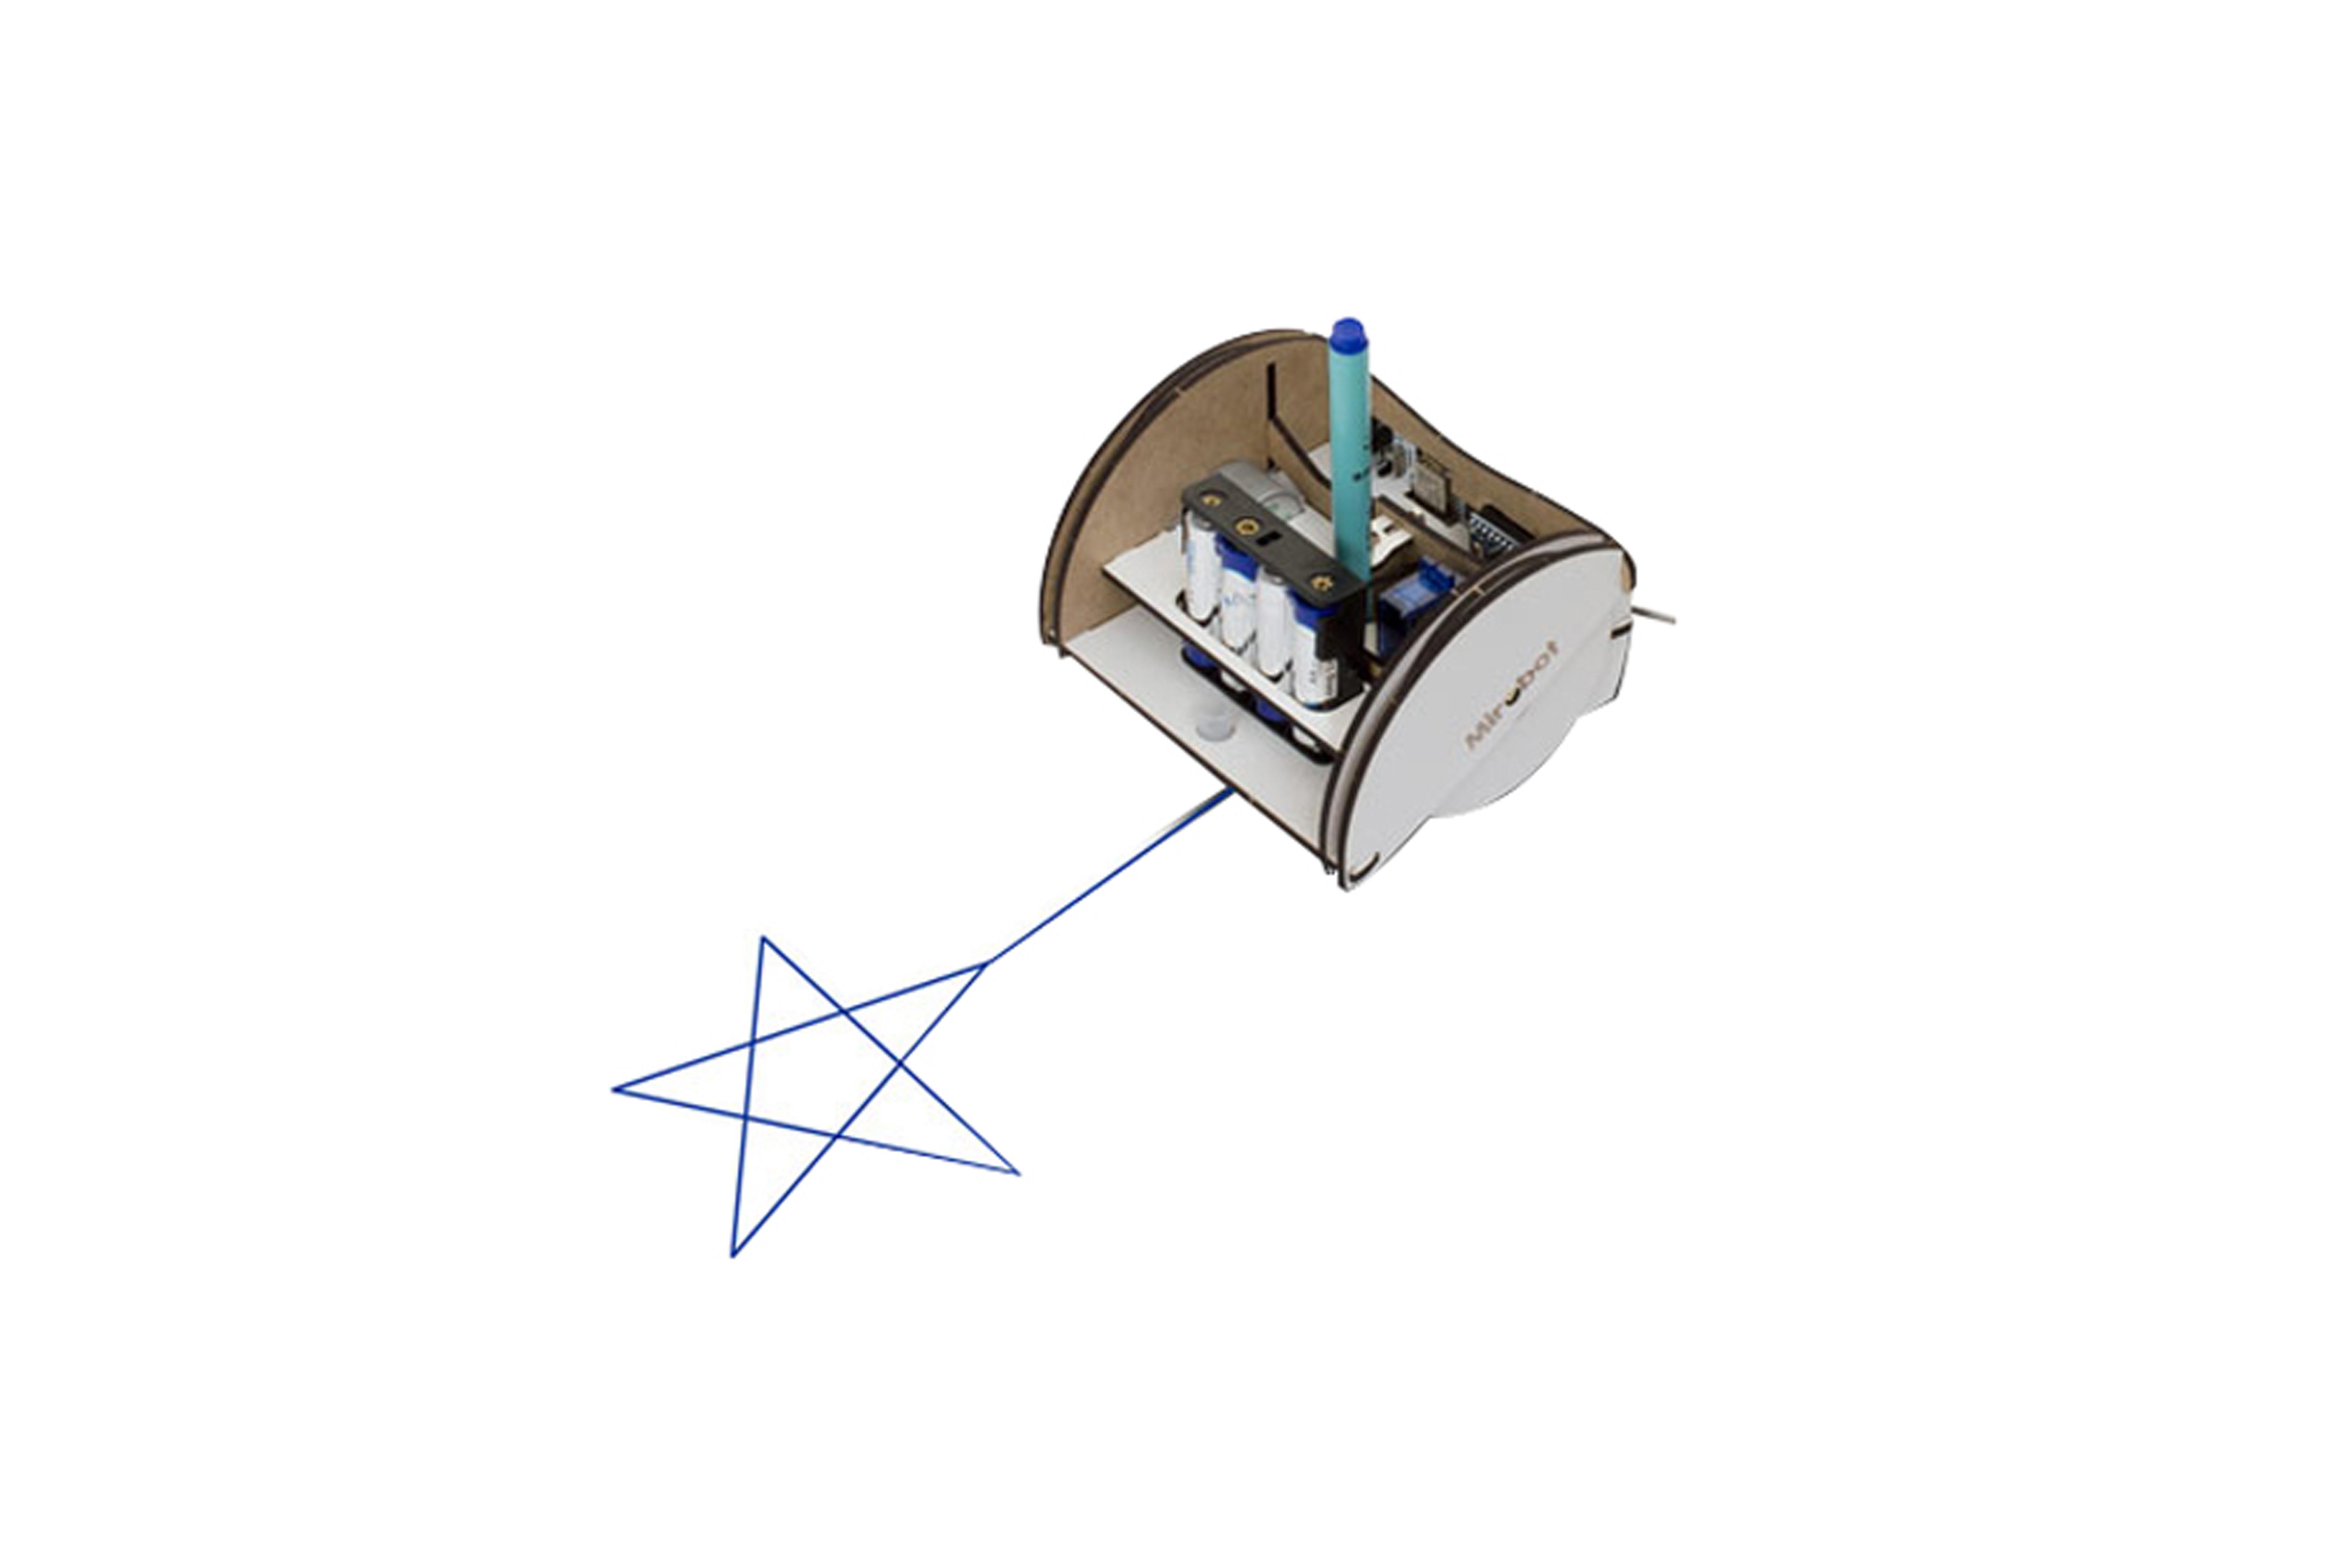 KIT ROBOT DISEGNO MIROBOT - KIT COMPLETO